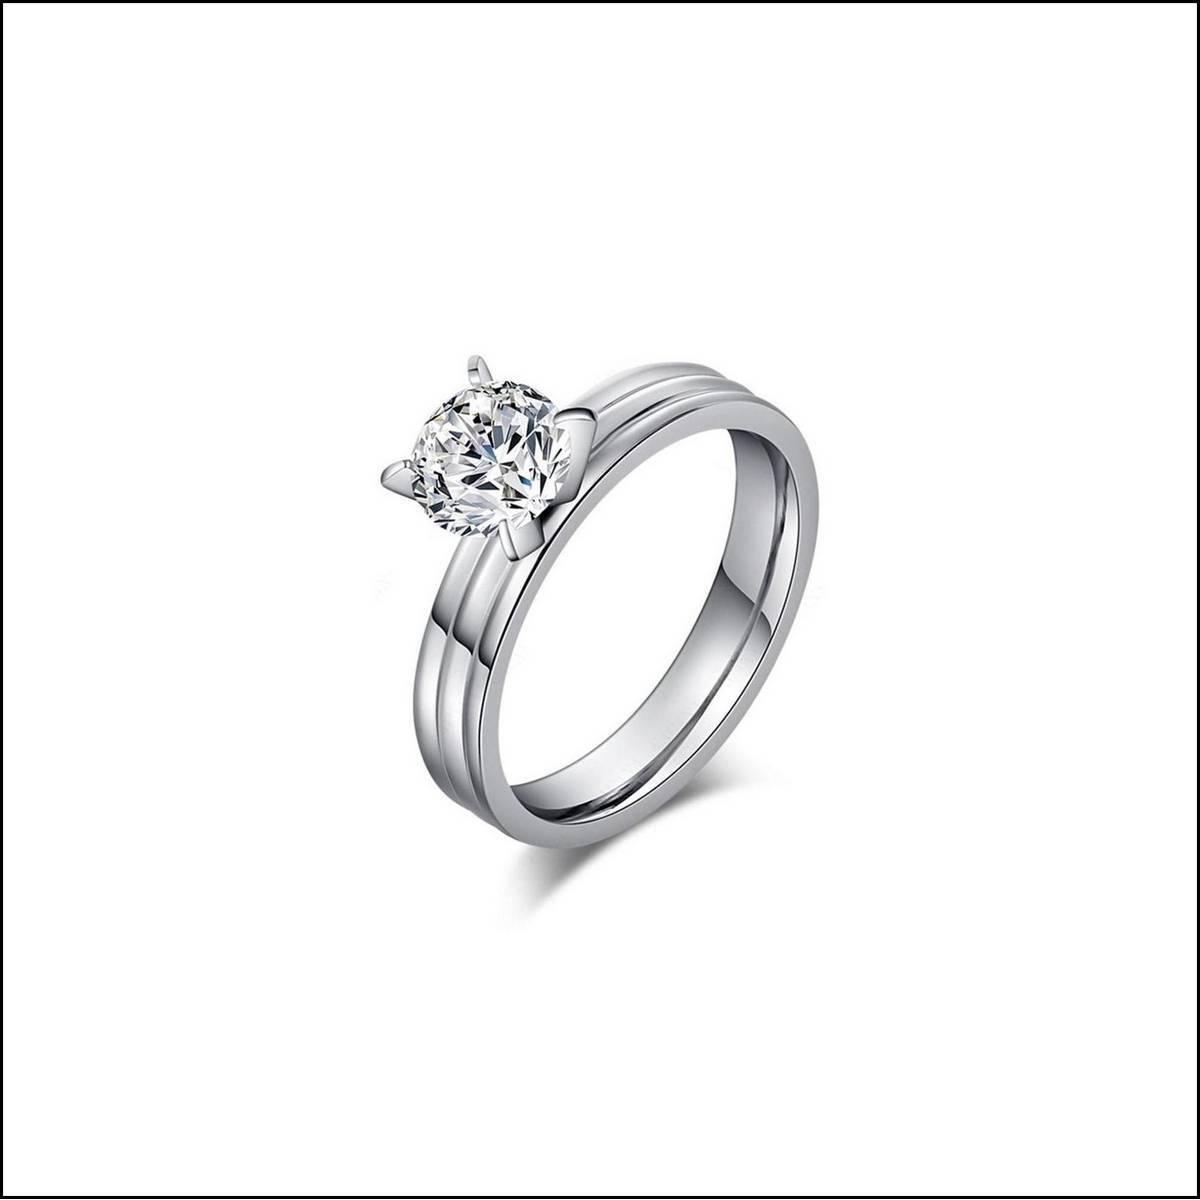 Black Hunter Random Designs Ladies Engagement Diamond Ring For Girls With Ring Box